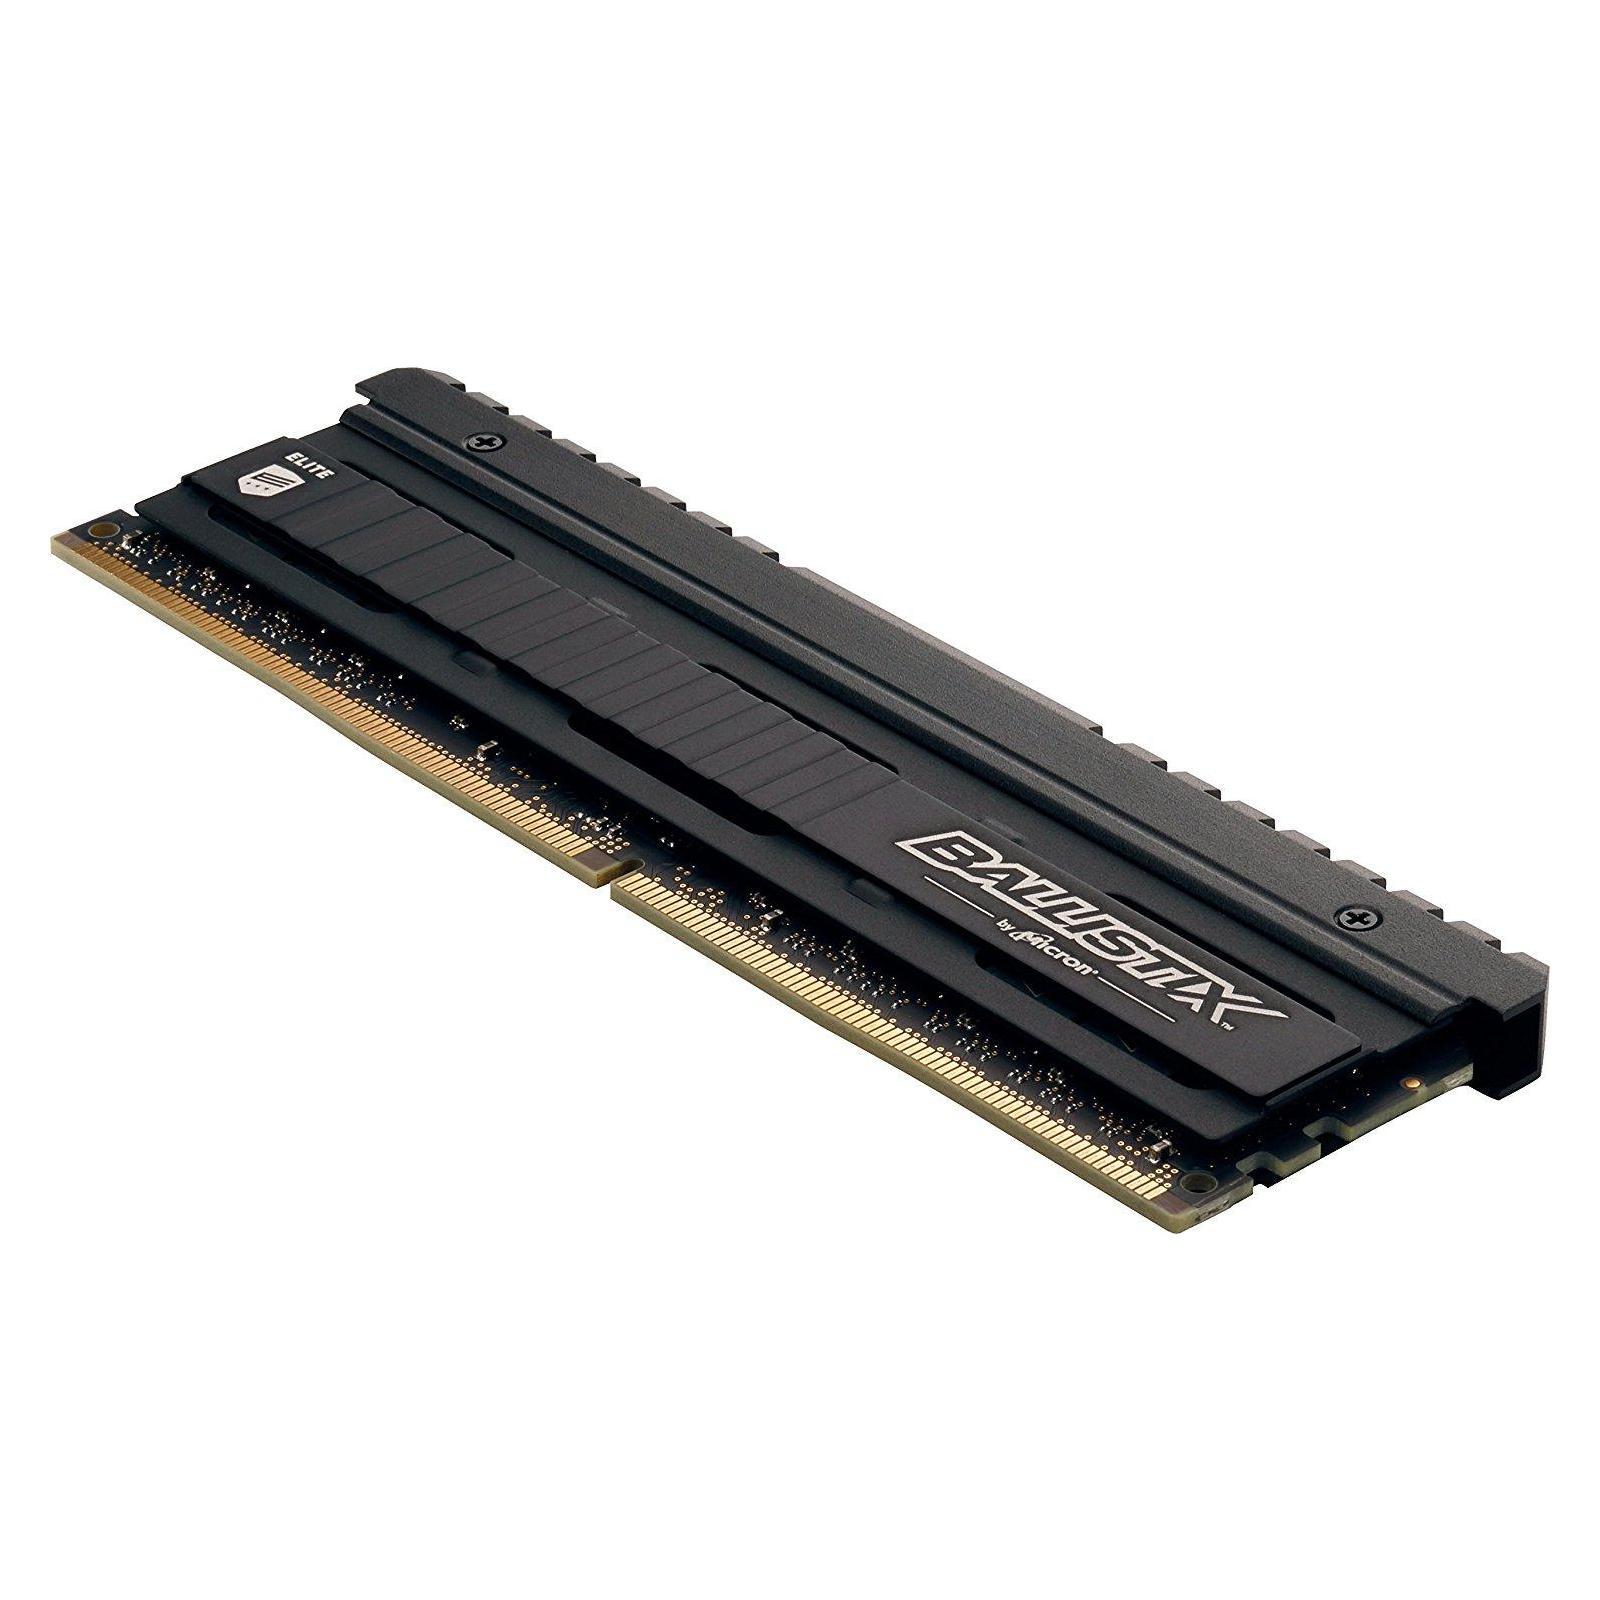 Модуль памяти для компьютера DDR4 16GB (2x8GB) 3200 MHz Ballistix Elite Micron (BLE2C8G4D32BEEAK) изображение 3